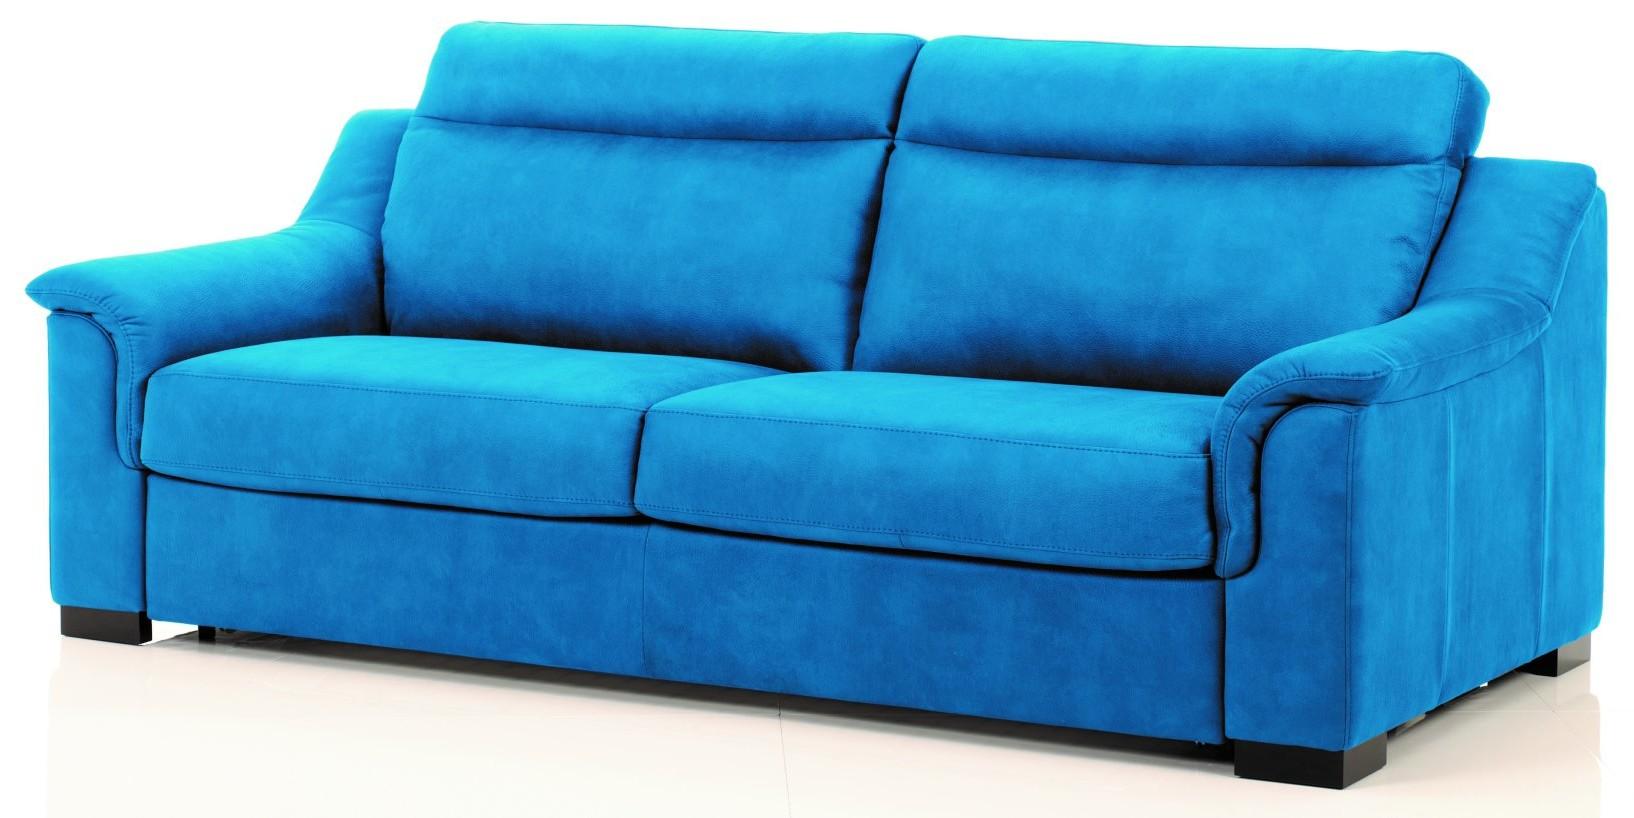 Canape Cuir Bleu Canard